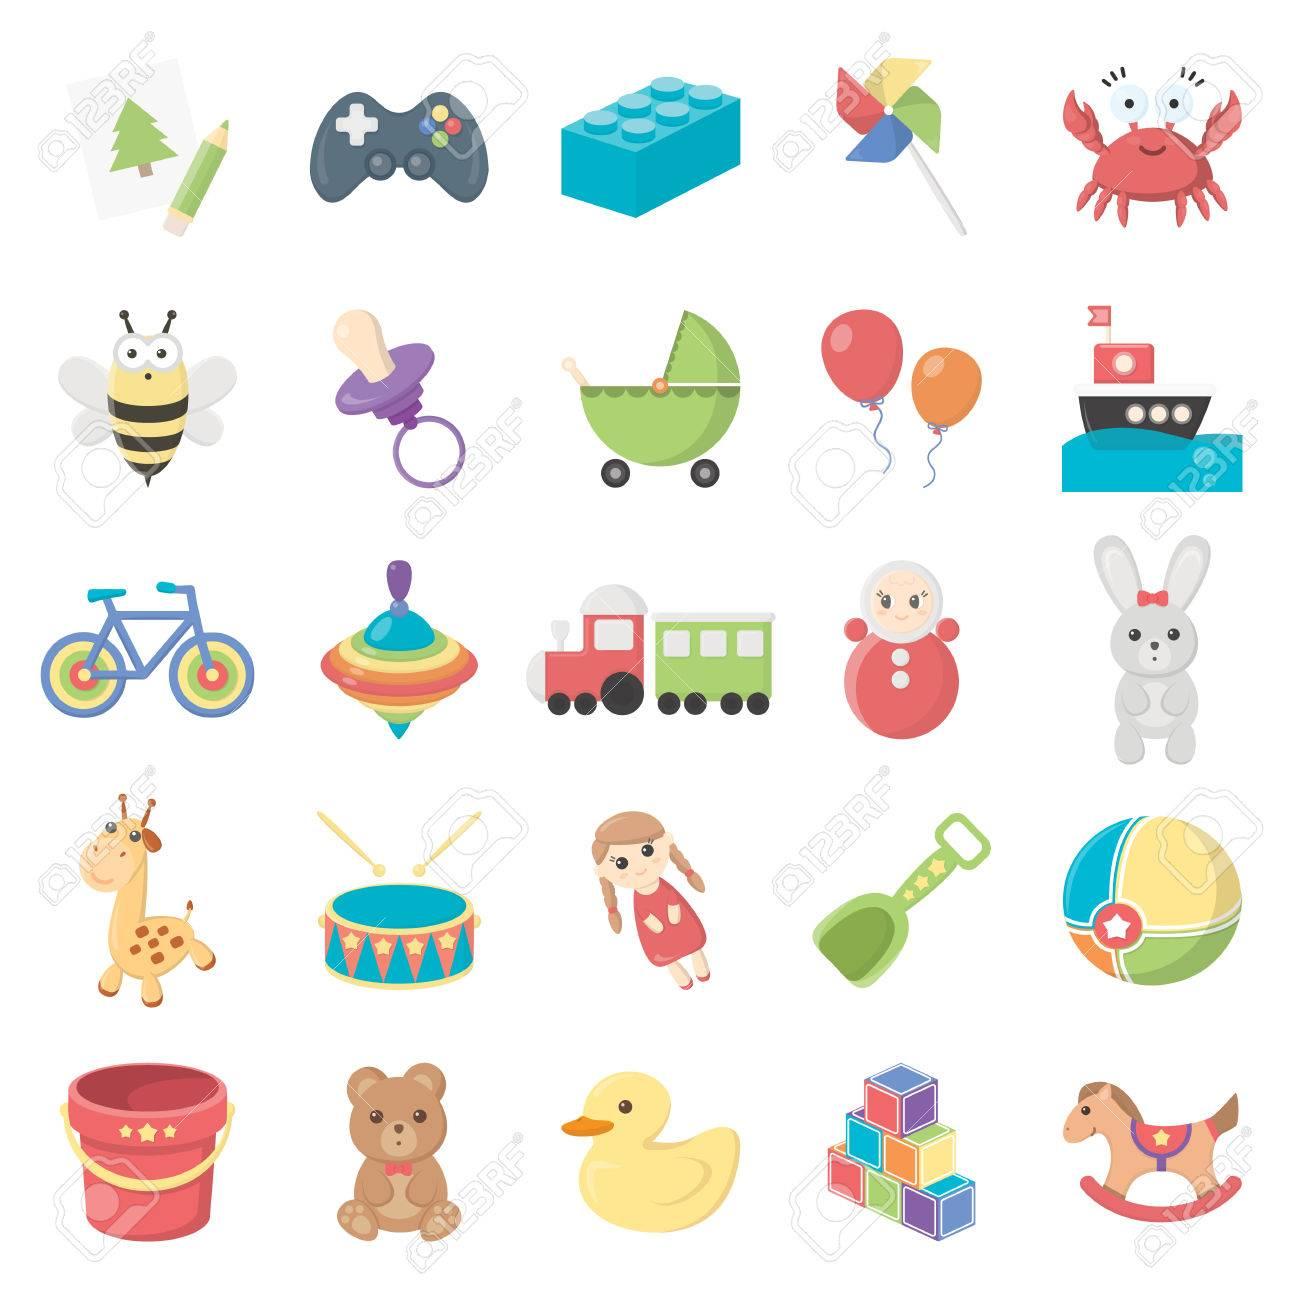 Toys 25 cartoon icons set for web design - 54750738